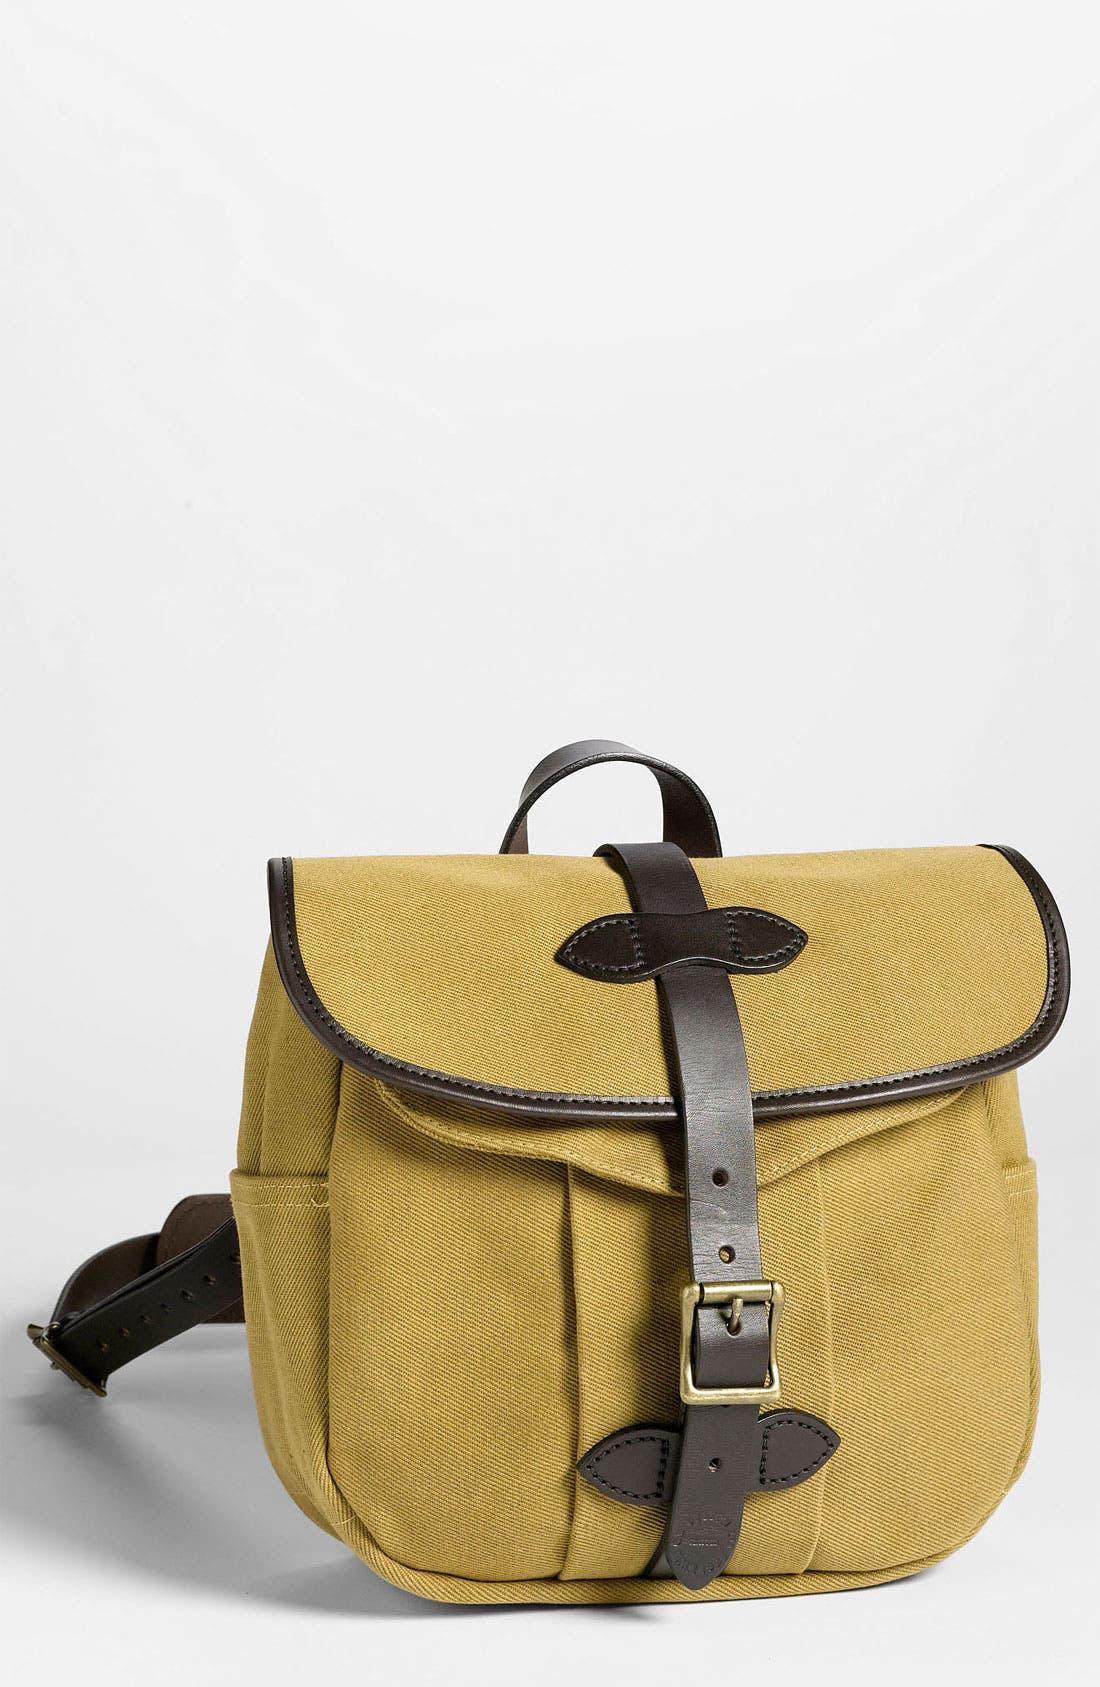 Main Image - Filson Small Field Bag